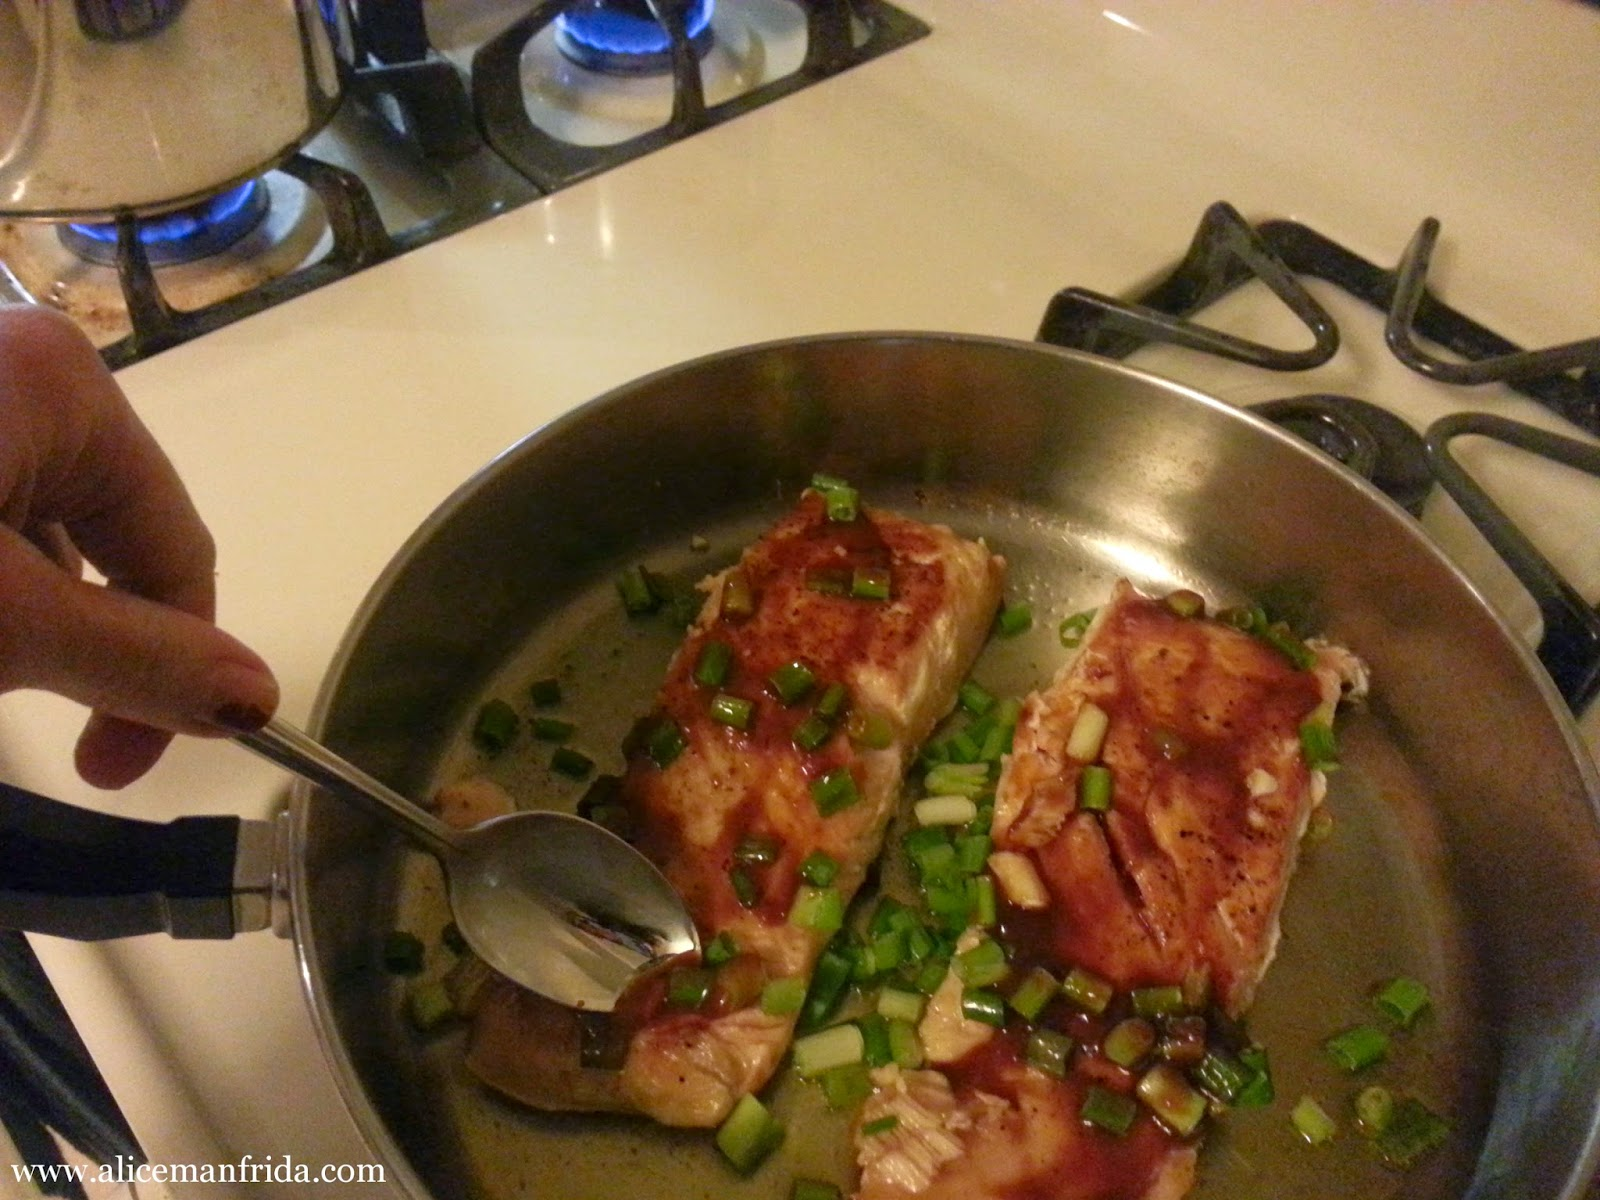 Tasty Tuesday, Alice Cooks